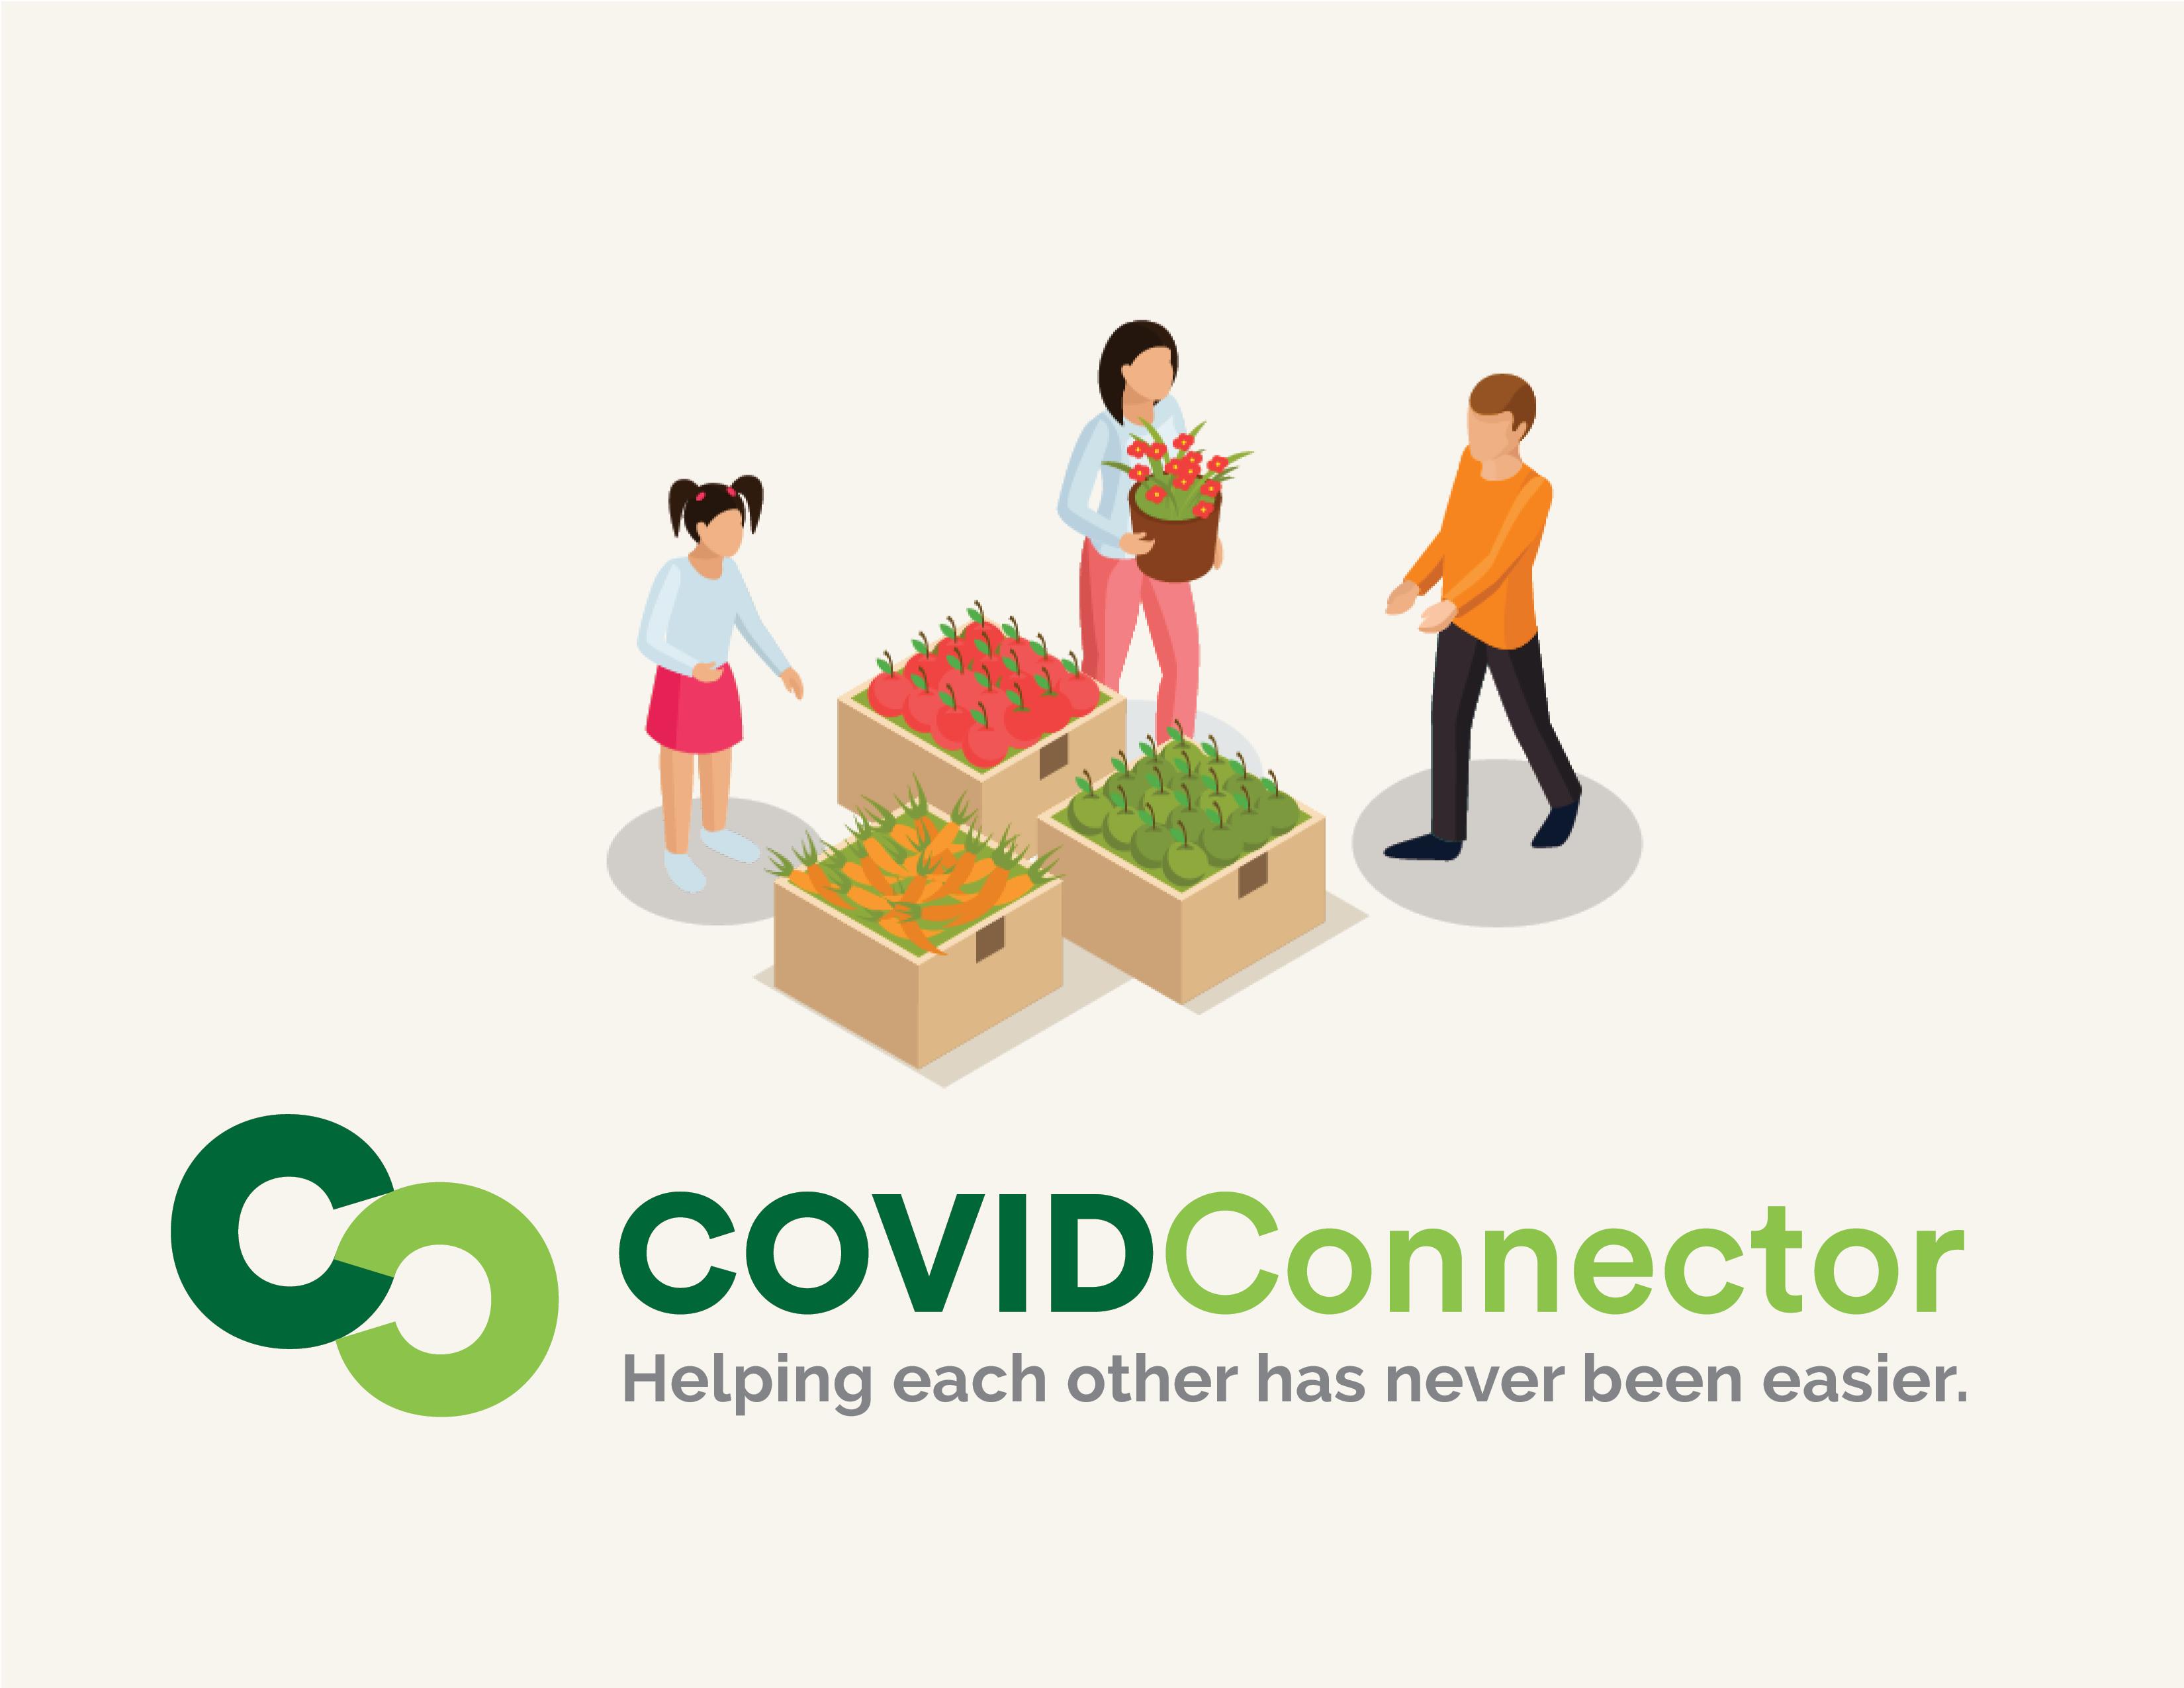 COVID Connector